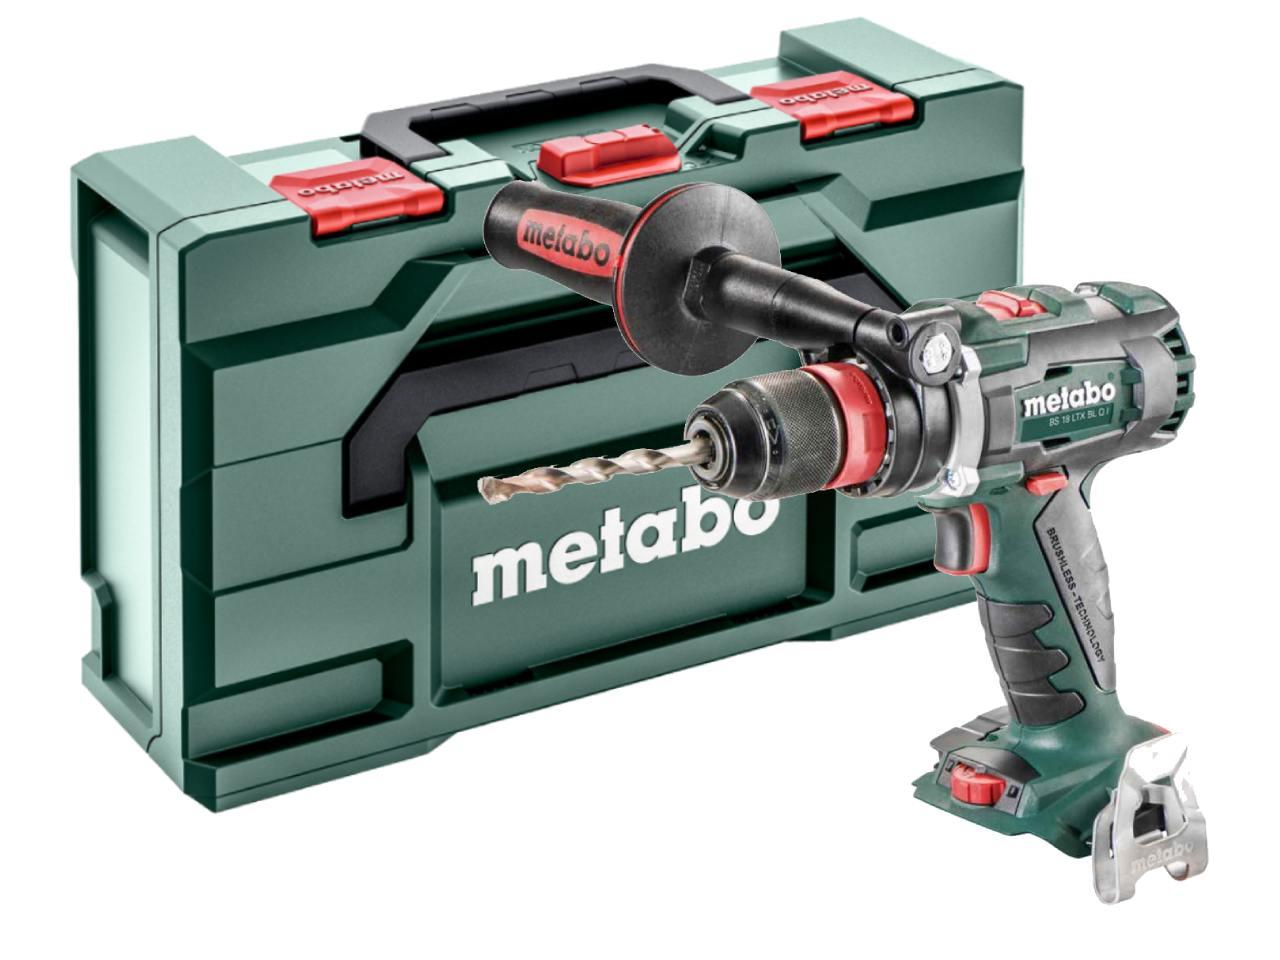 metabo bs18ltxblqi 18v quick brusless drill driver bare unit ebay. Black Bedroom Furniture Sets. Home Design Ideas